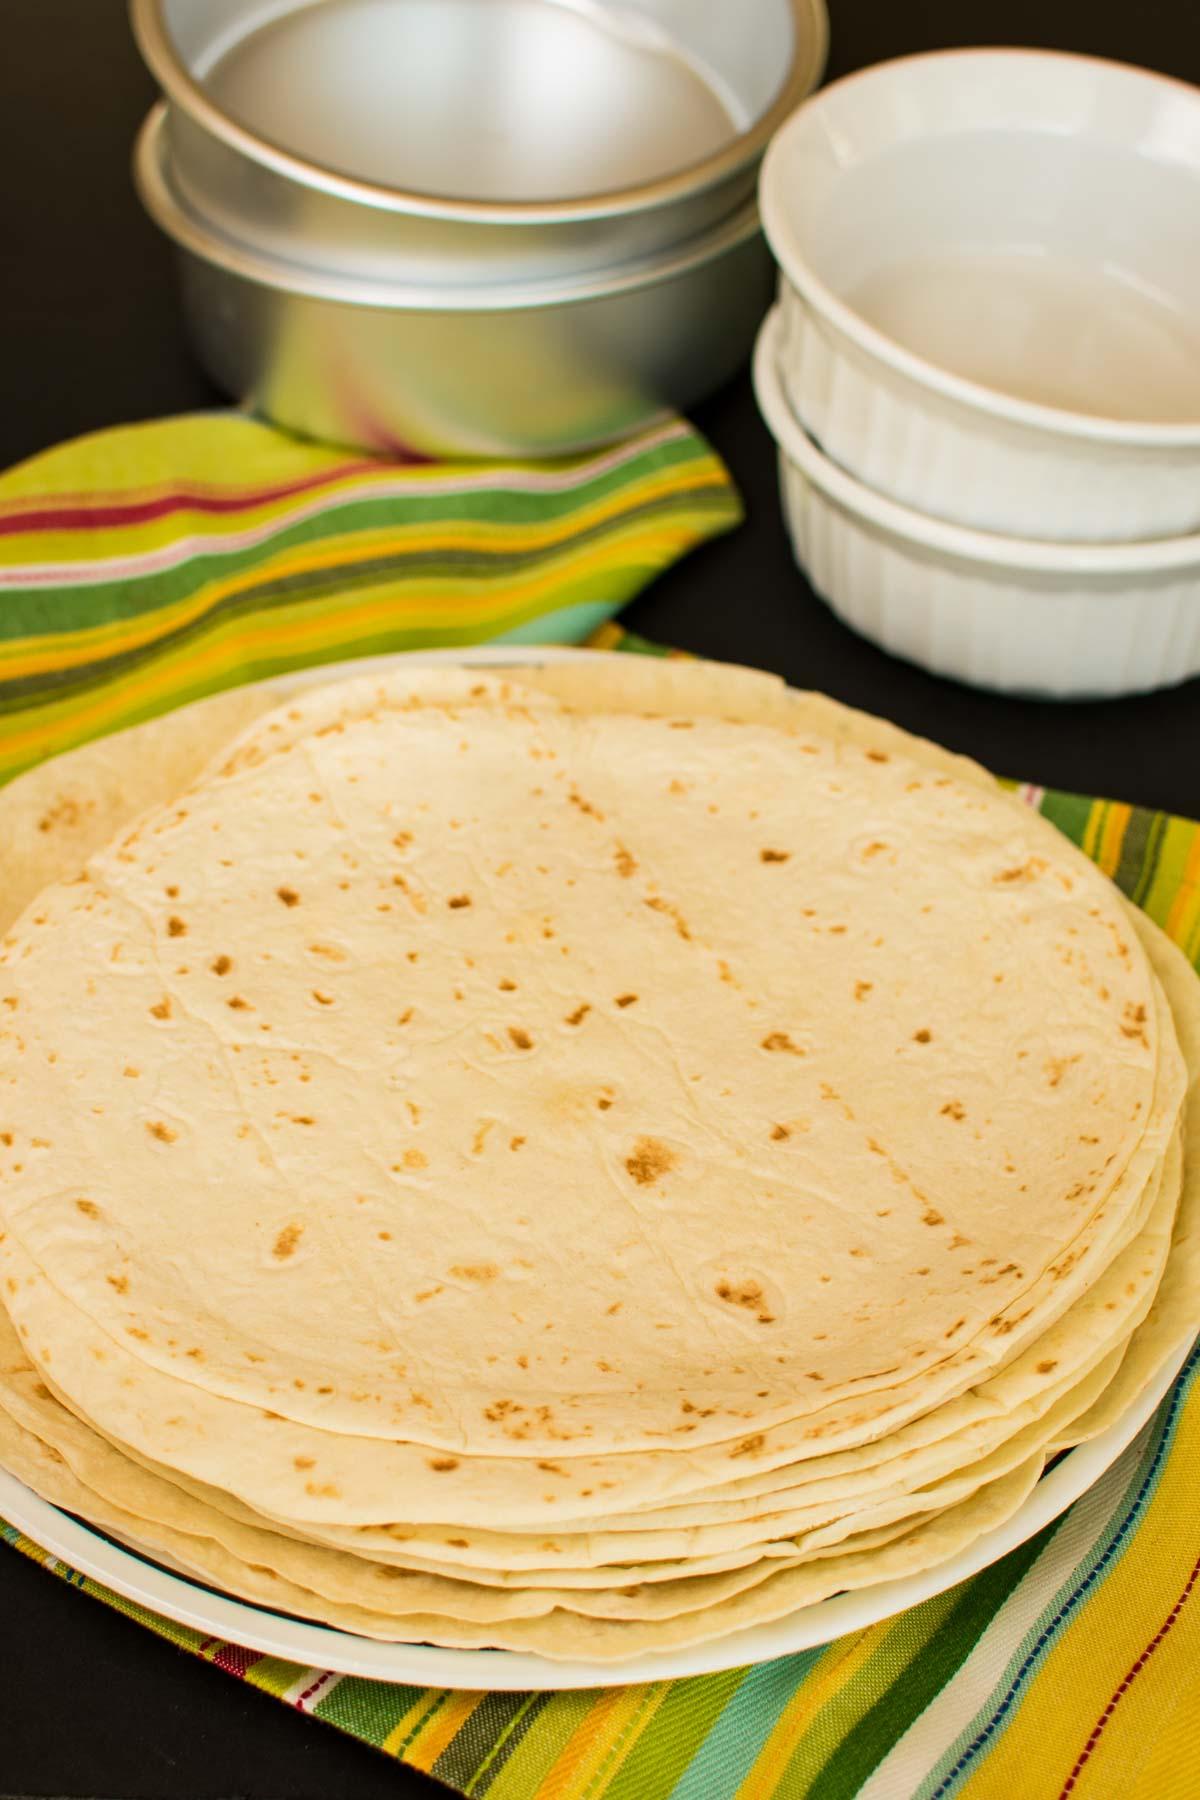 A stack of flour tortillas.